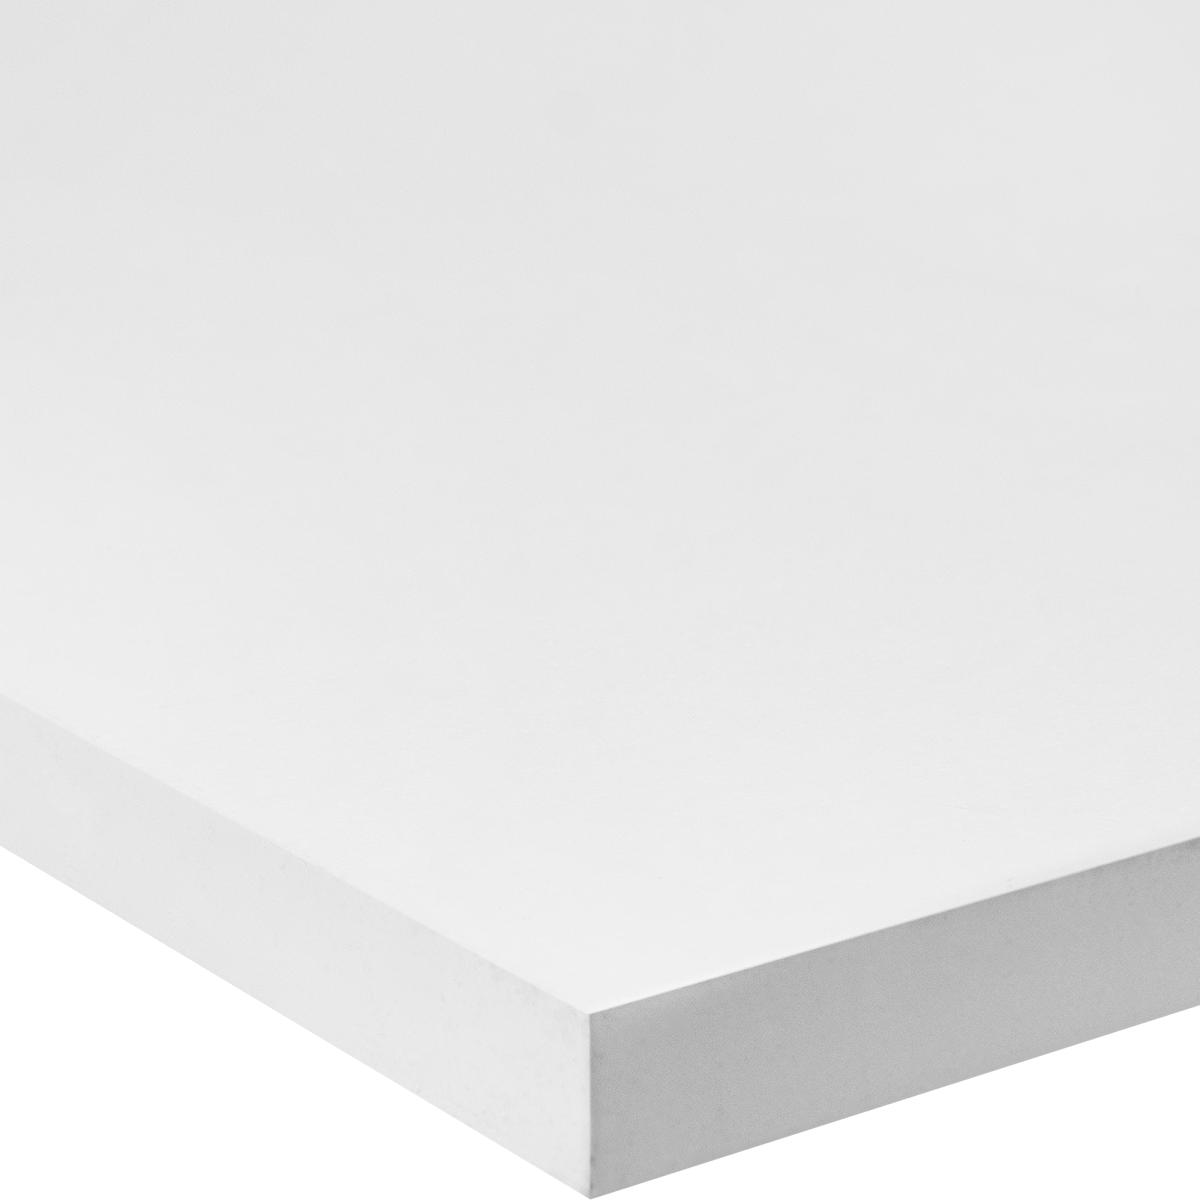 Деталь мебельная 2000х300х16 мм ЛДСП цвет белый кромка с длинных сторон